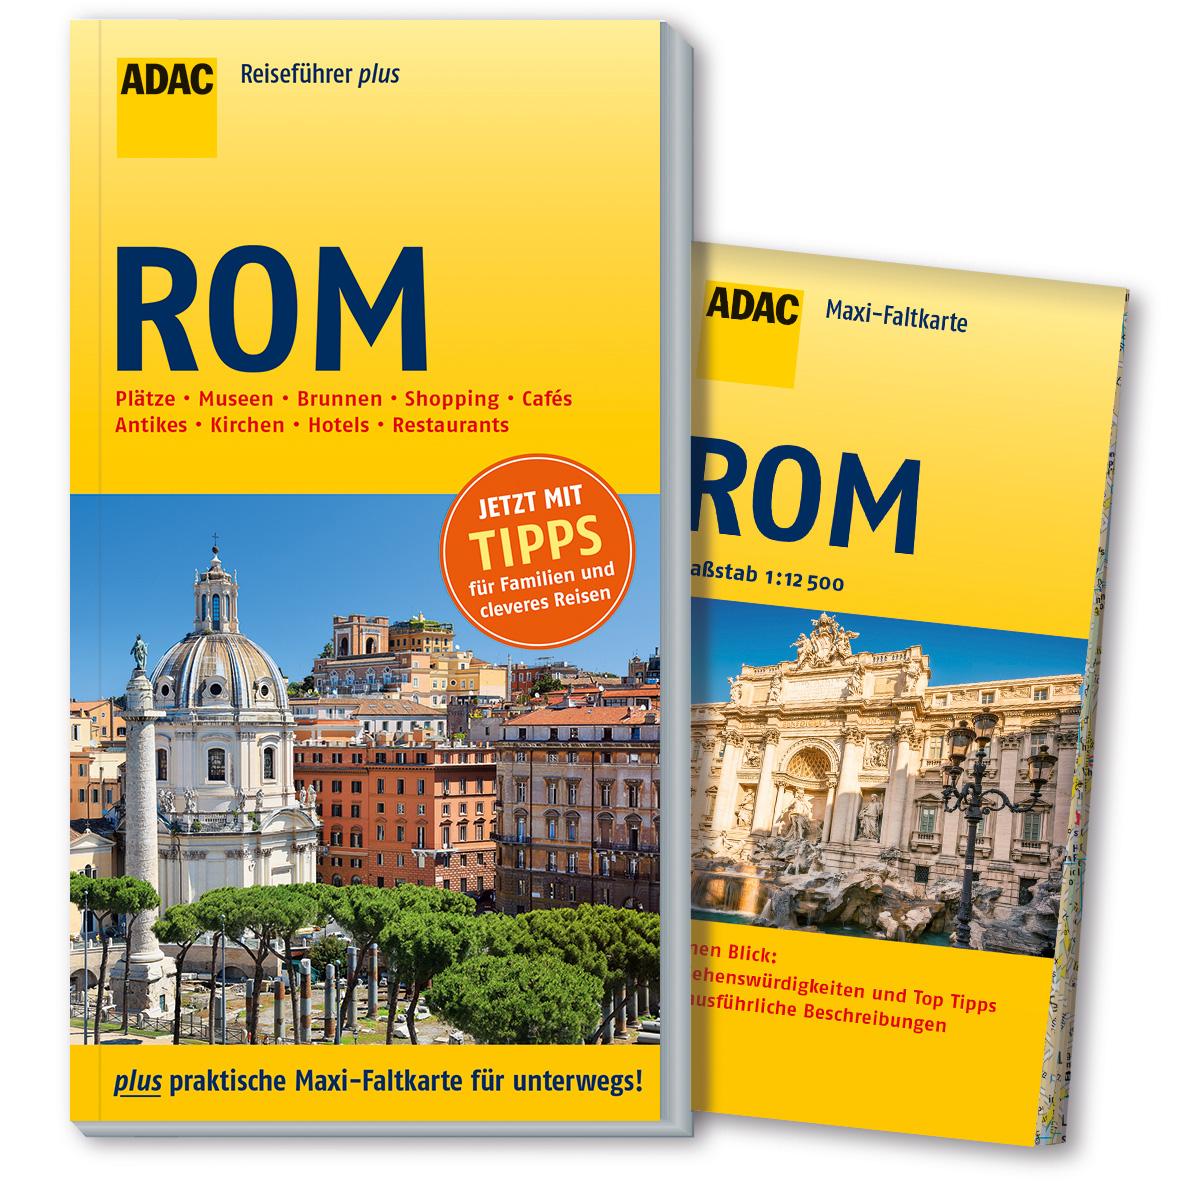 ADAC Reiseführer plus Rom